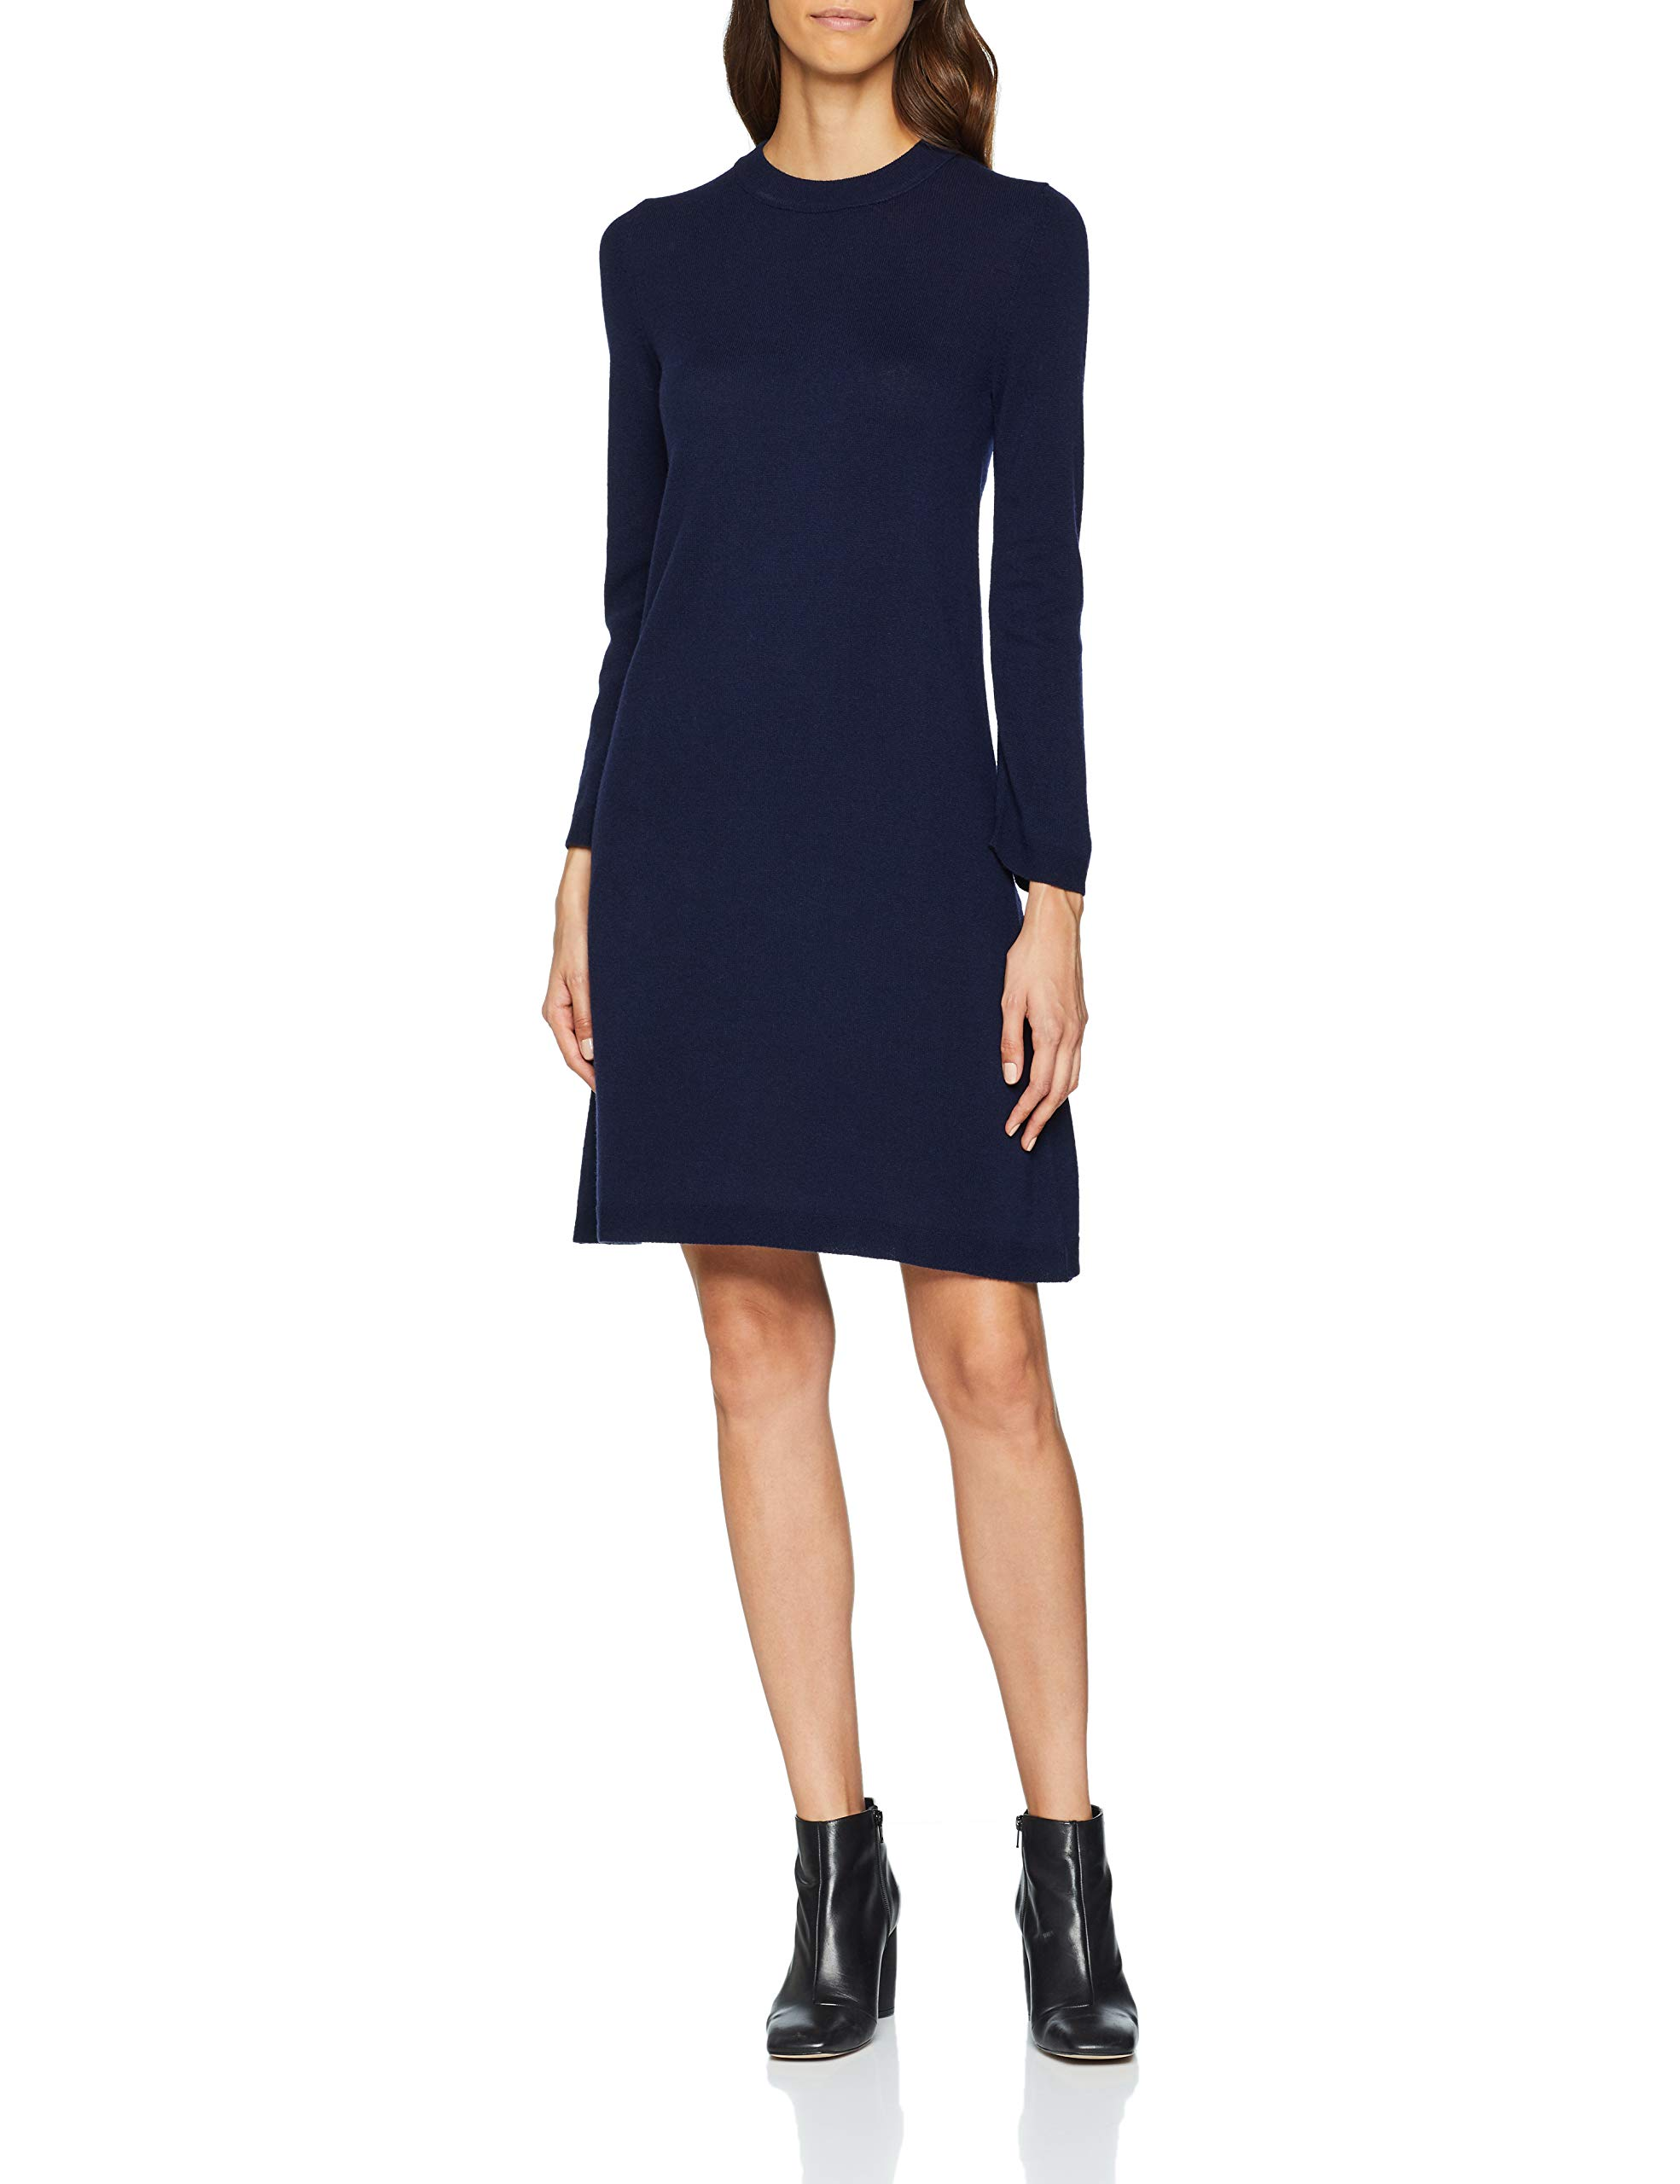 Blue United Benetton Dress 016Large RobeBleudark Colors Of Femme jLqAR345cS